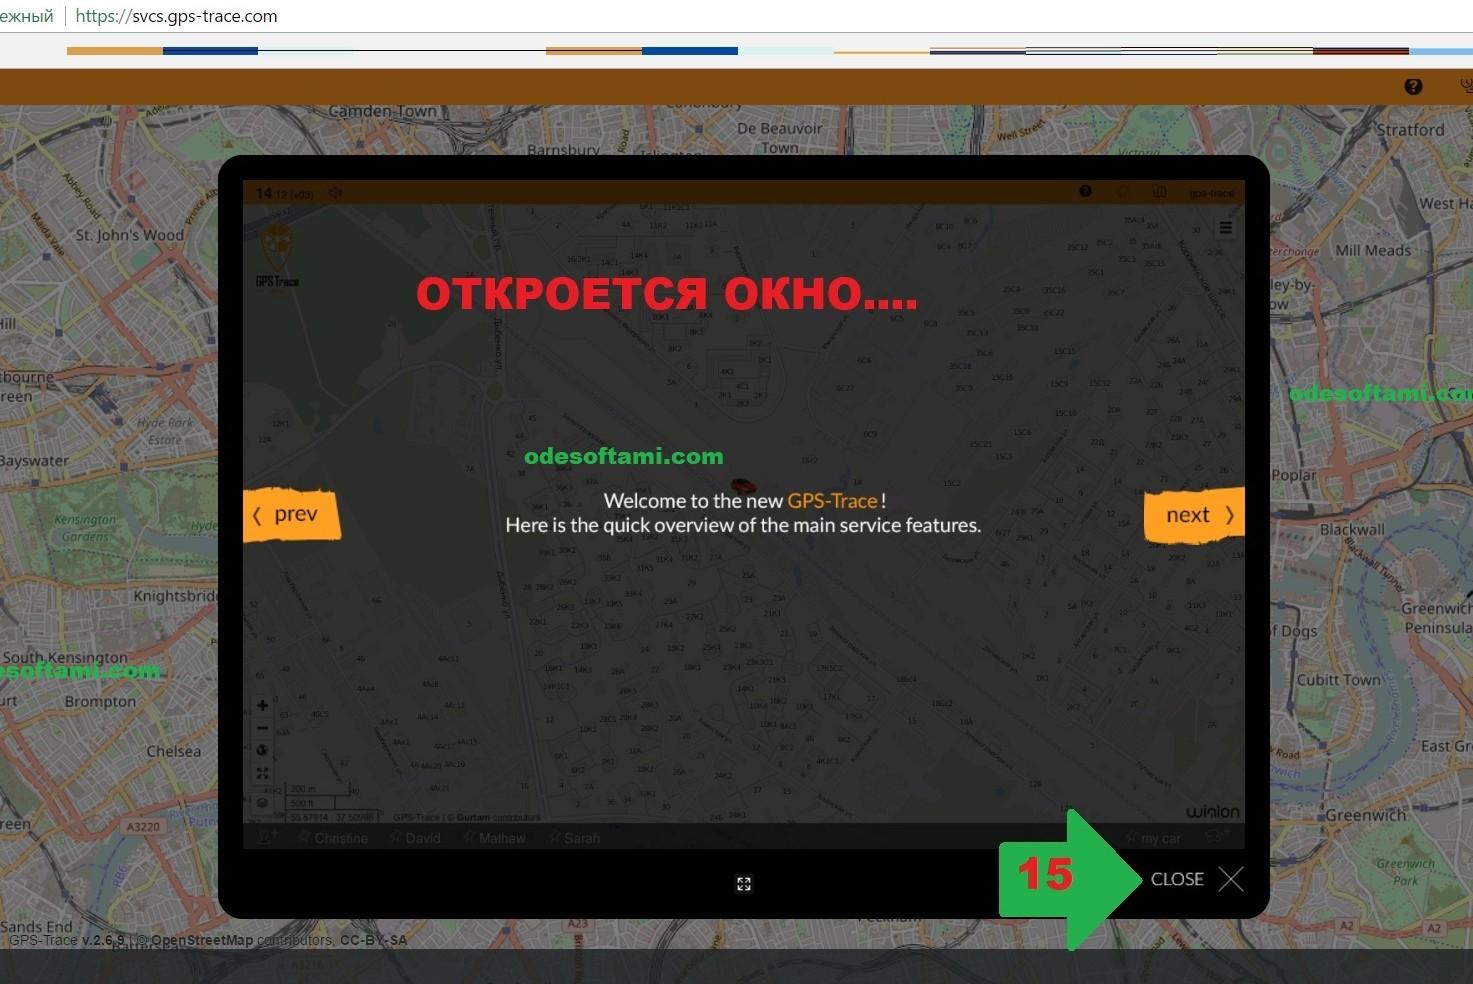 0010-nastroika-ORANGE-GPS-TRACE-trackera-na-novoi-versii-saita-odesoftami.com-43654GDdfg